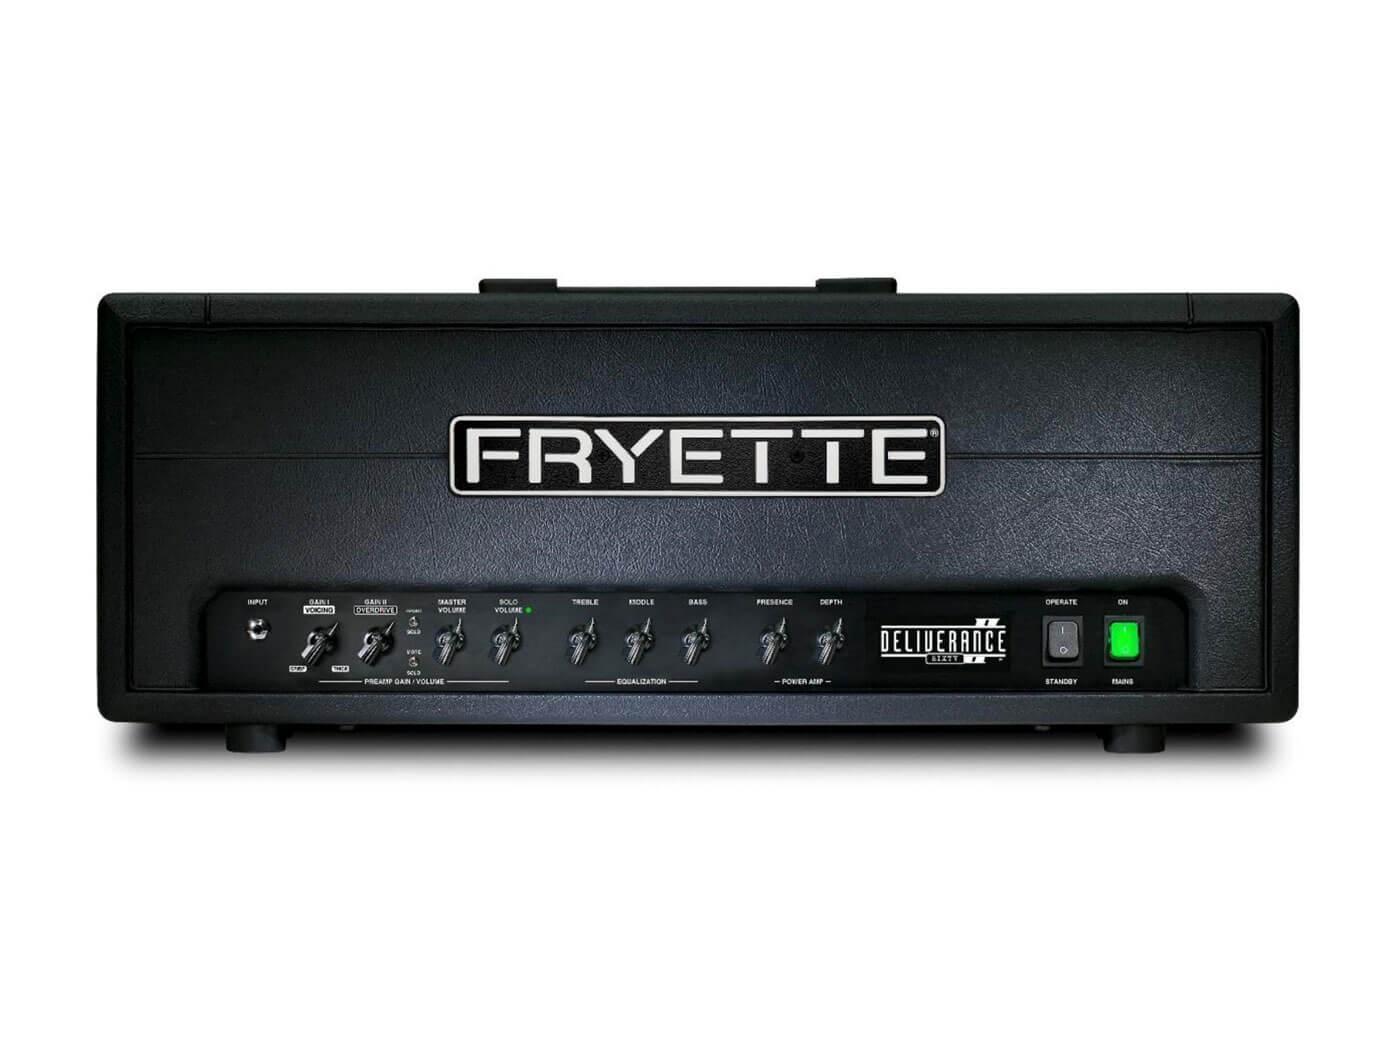 The Fryette Deliverance II